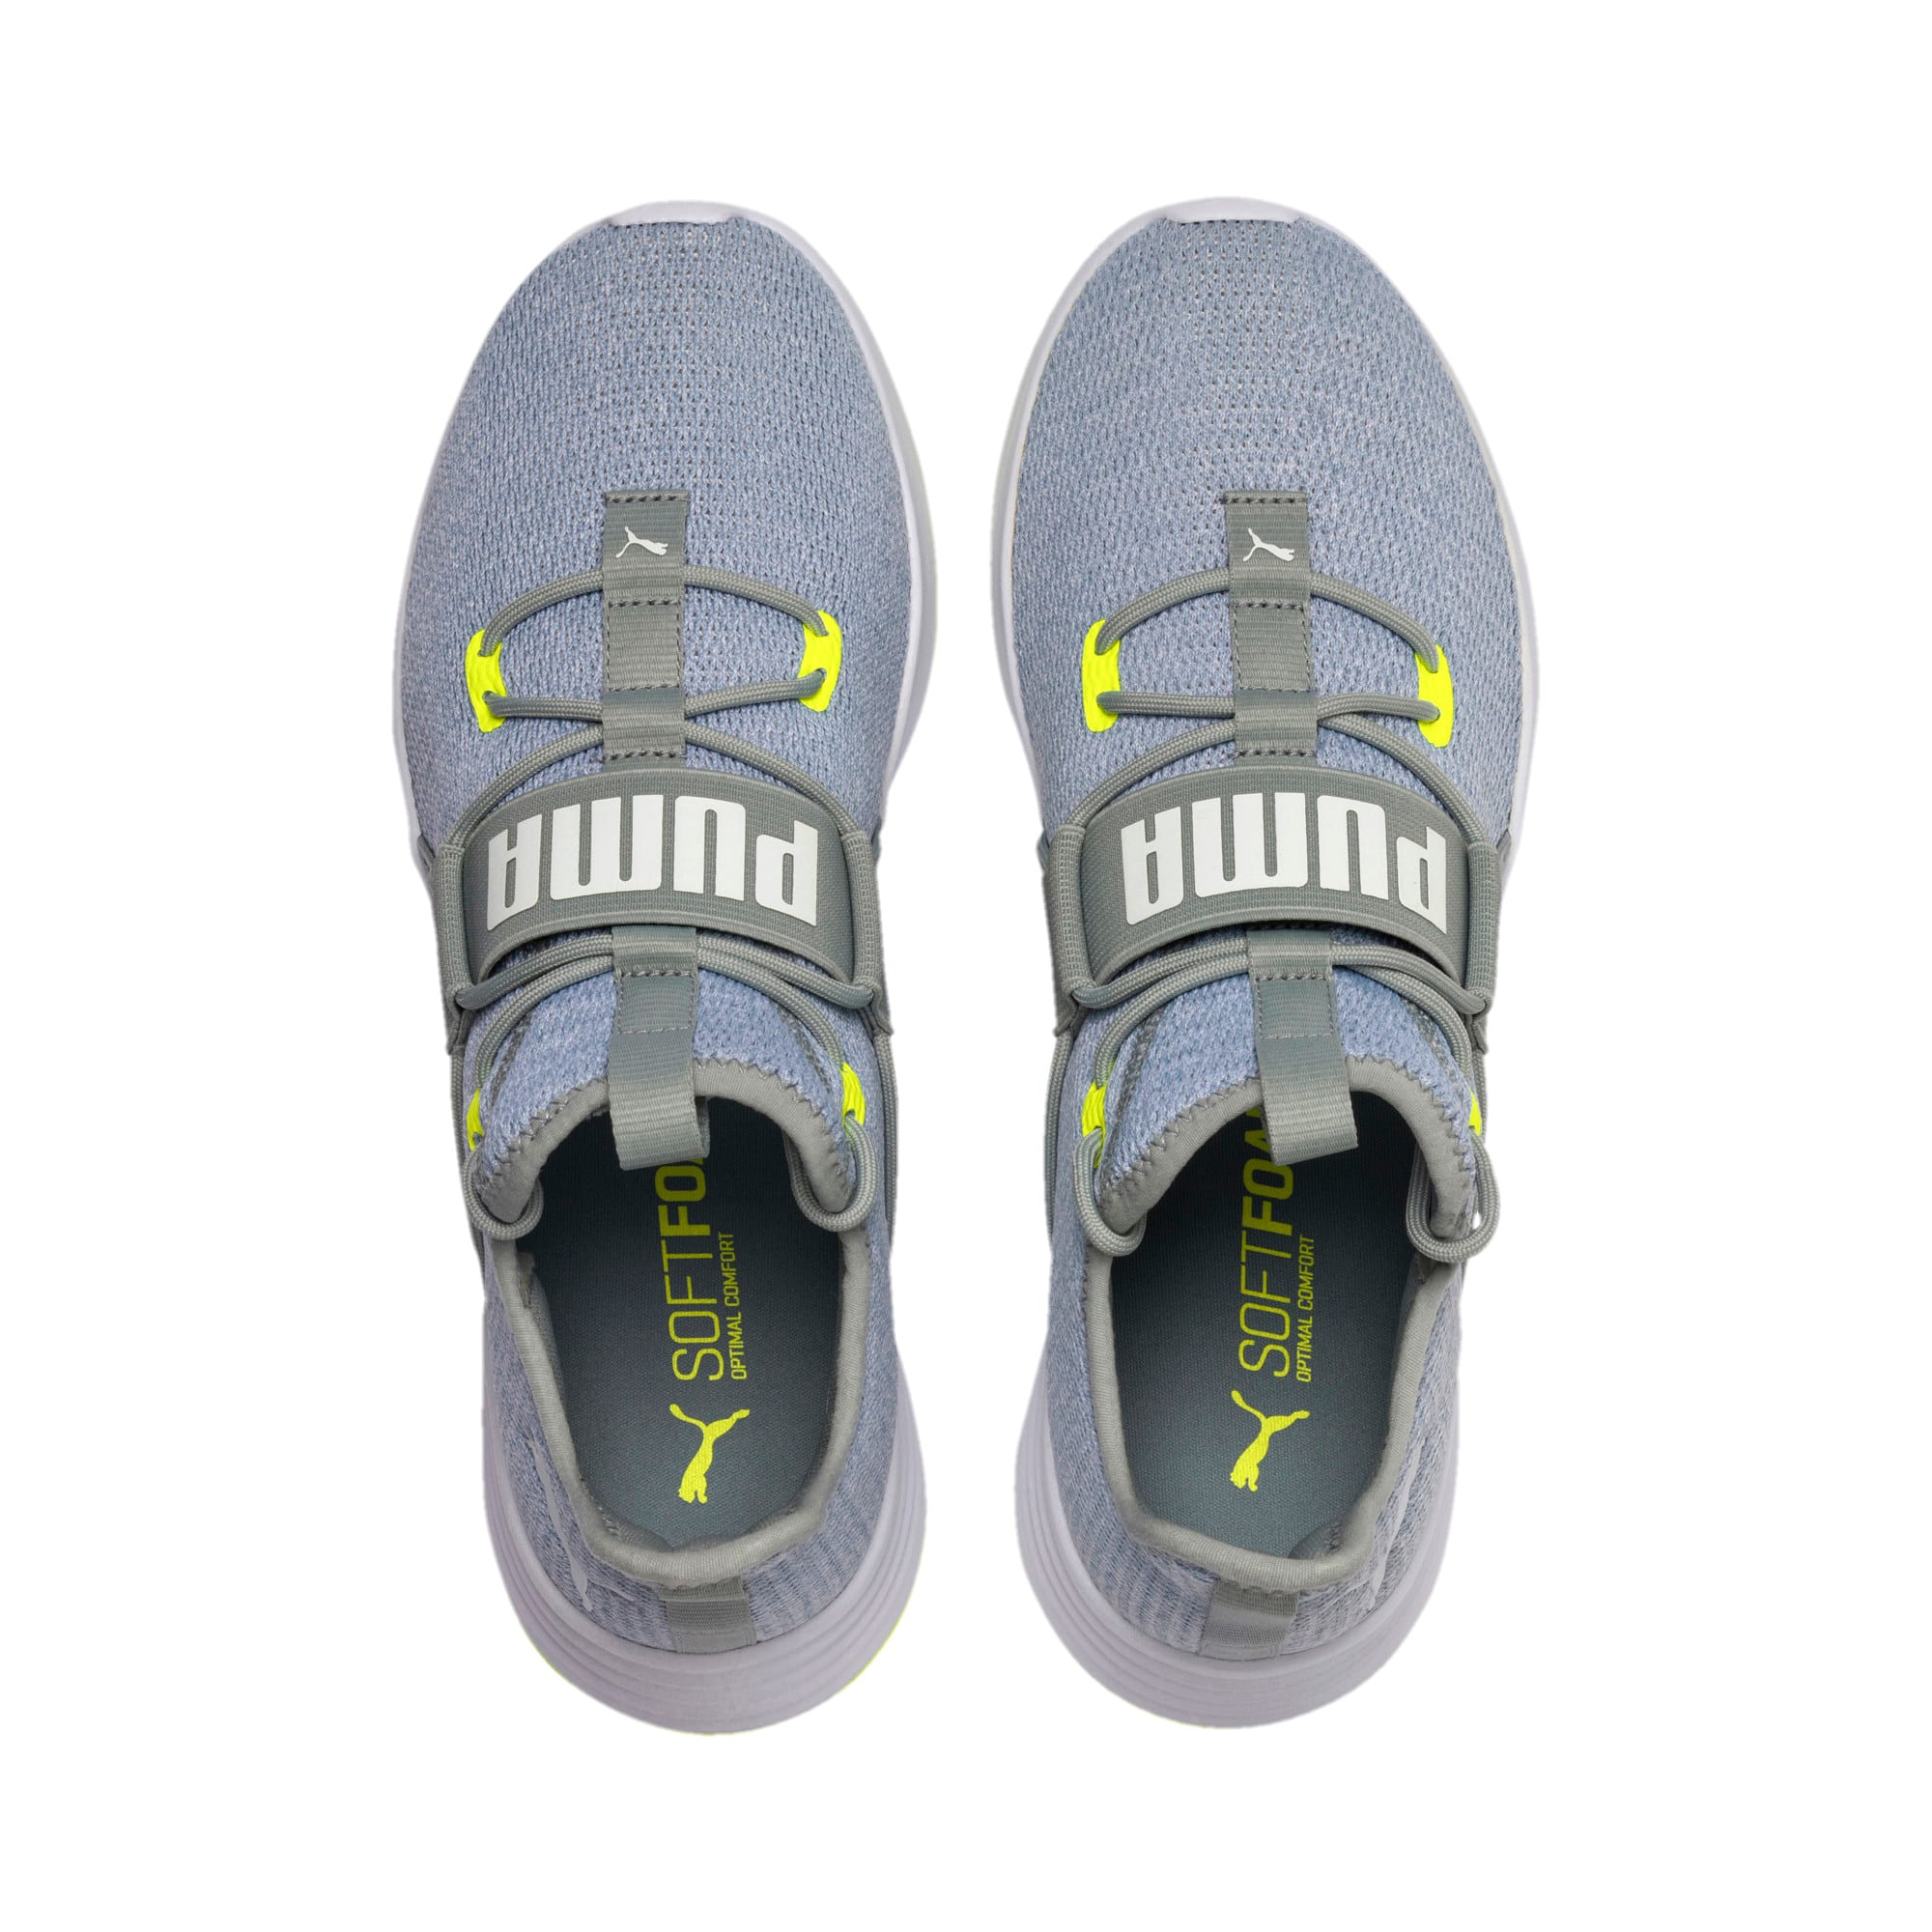 Thumbnail 6 of Persist XT Men's Training Shoes, Quarry-Fizzy Yellow-White, medium